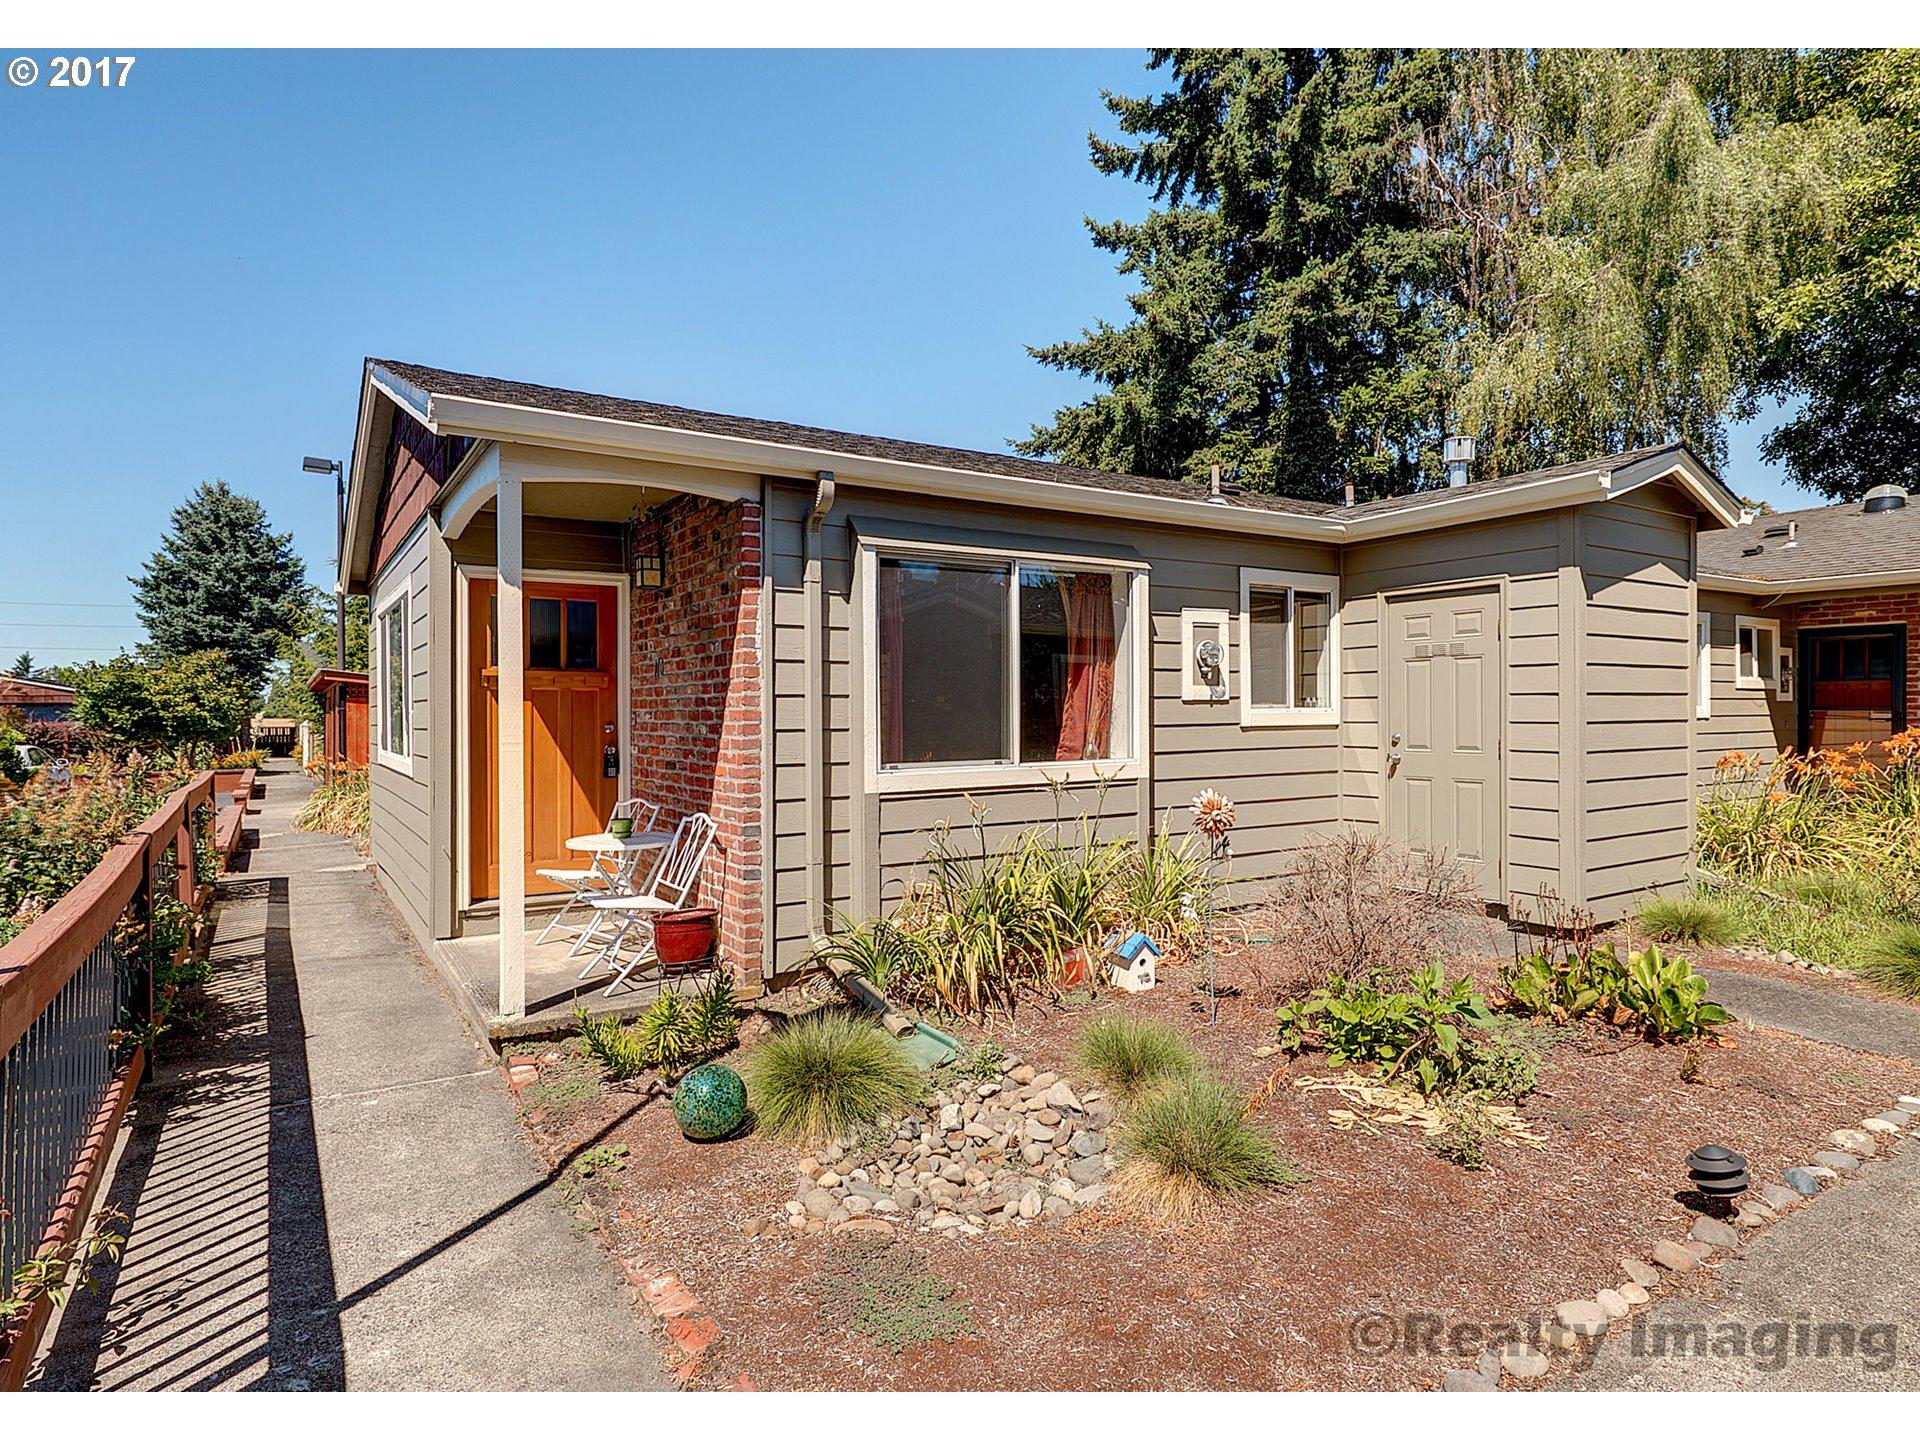 110 SE 73RD AVE, Portland, OR 97215